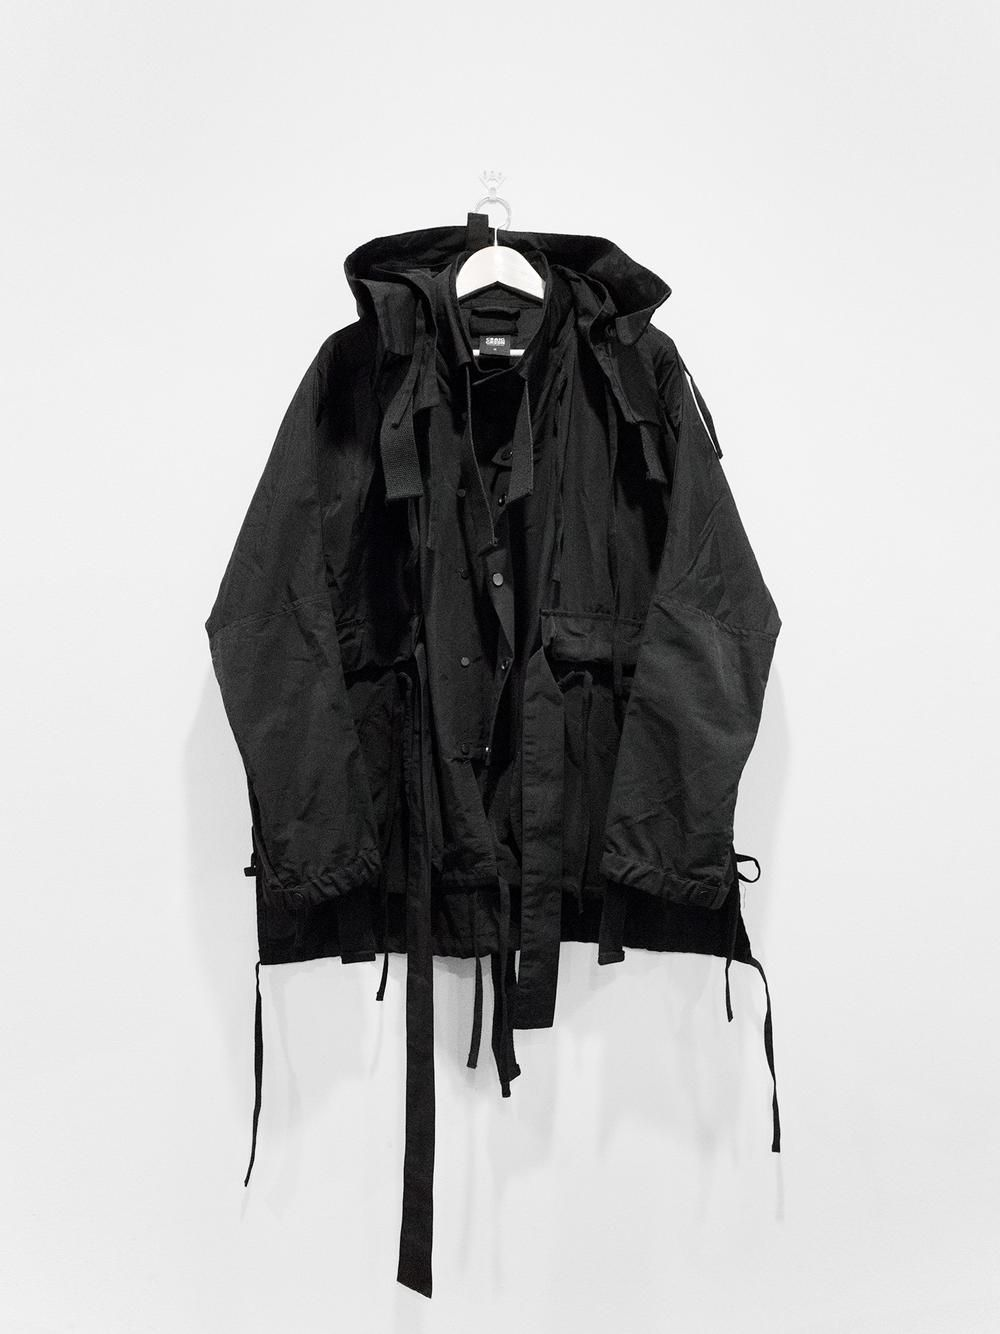 Craig Green Aw15 Parachute Jacket Jackets Craig Green Leather Outerwear